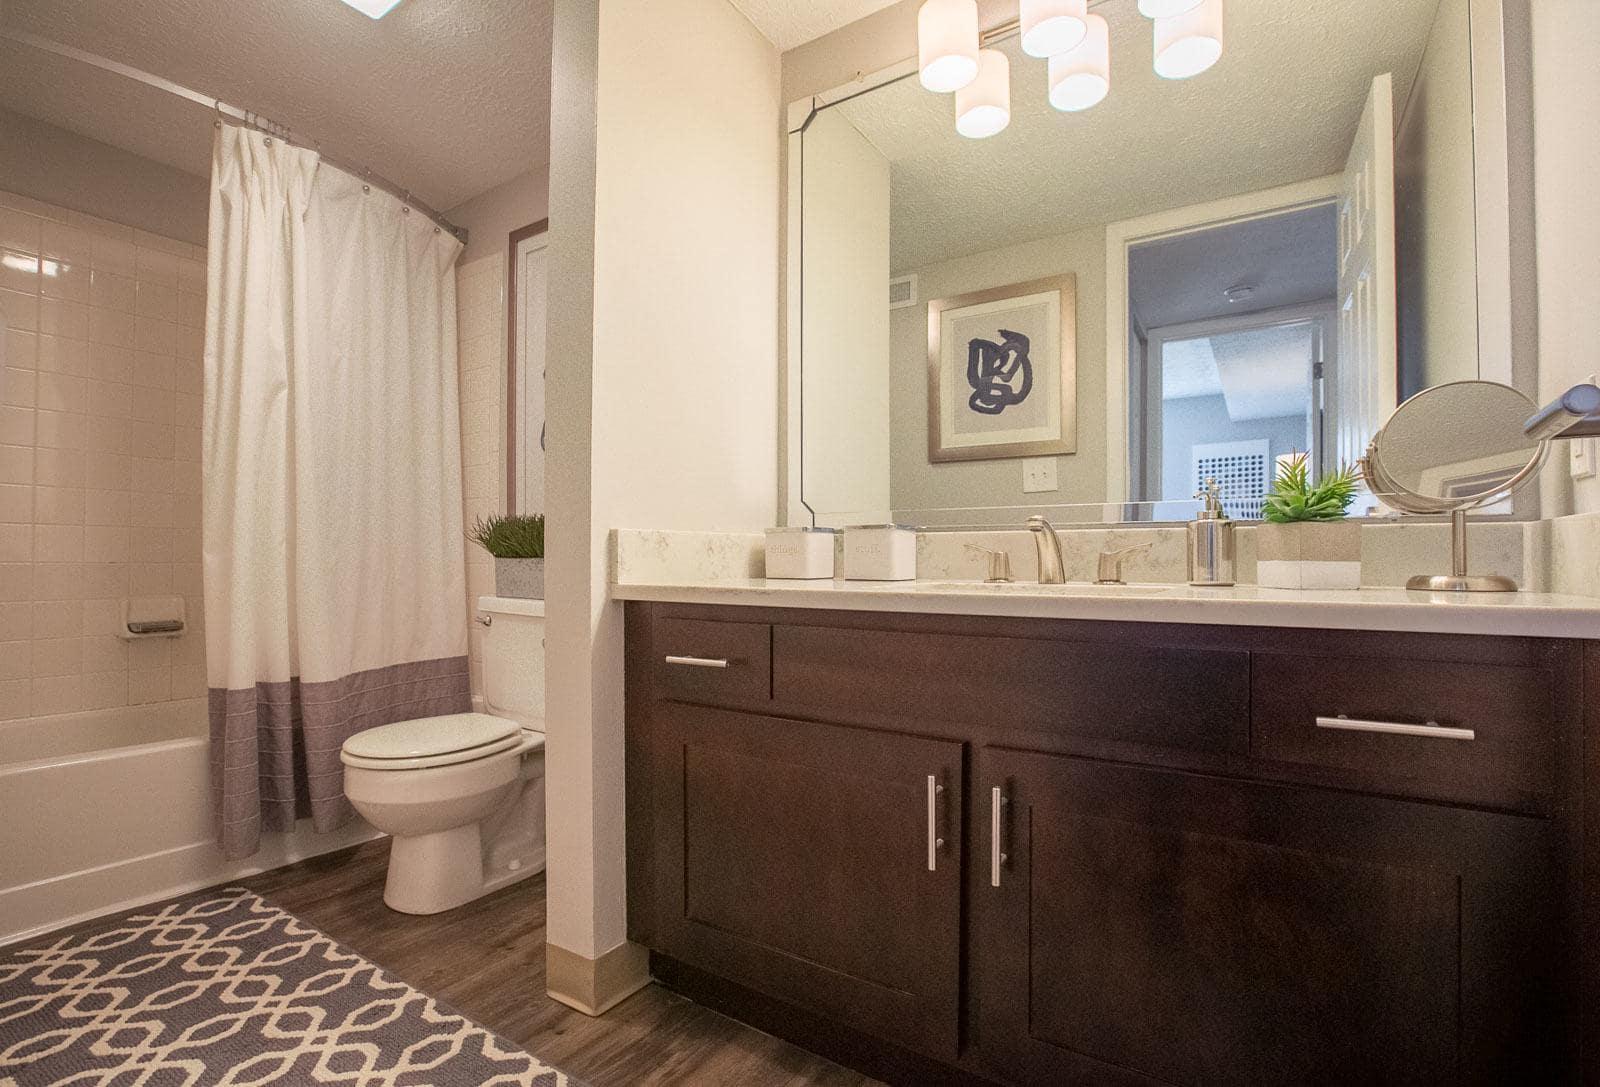 Example bathroom at apartments in Westlake